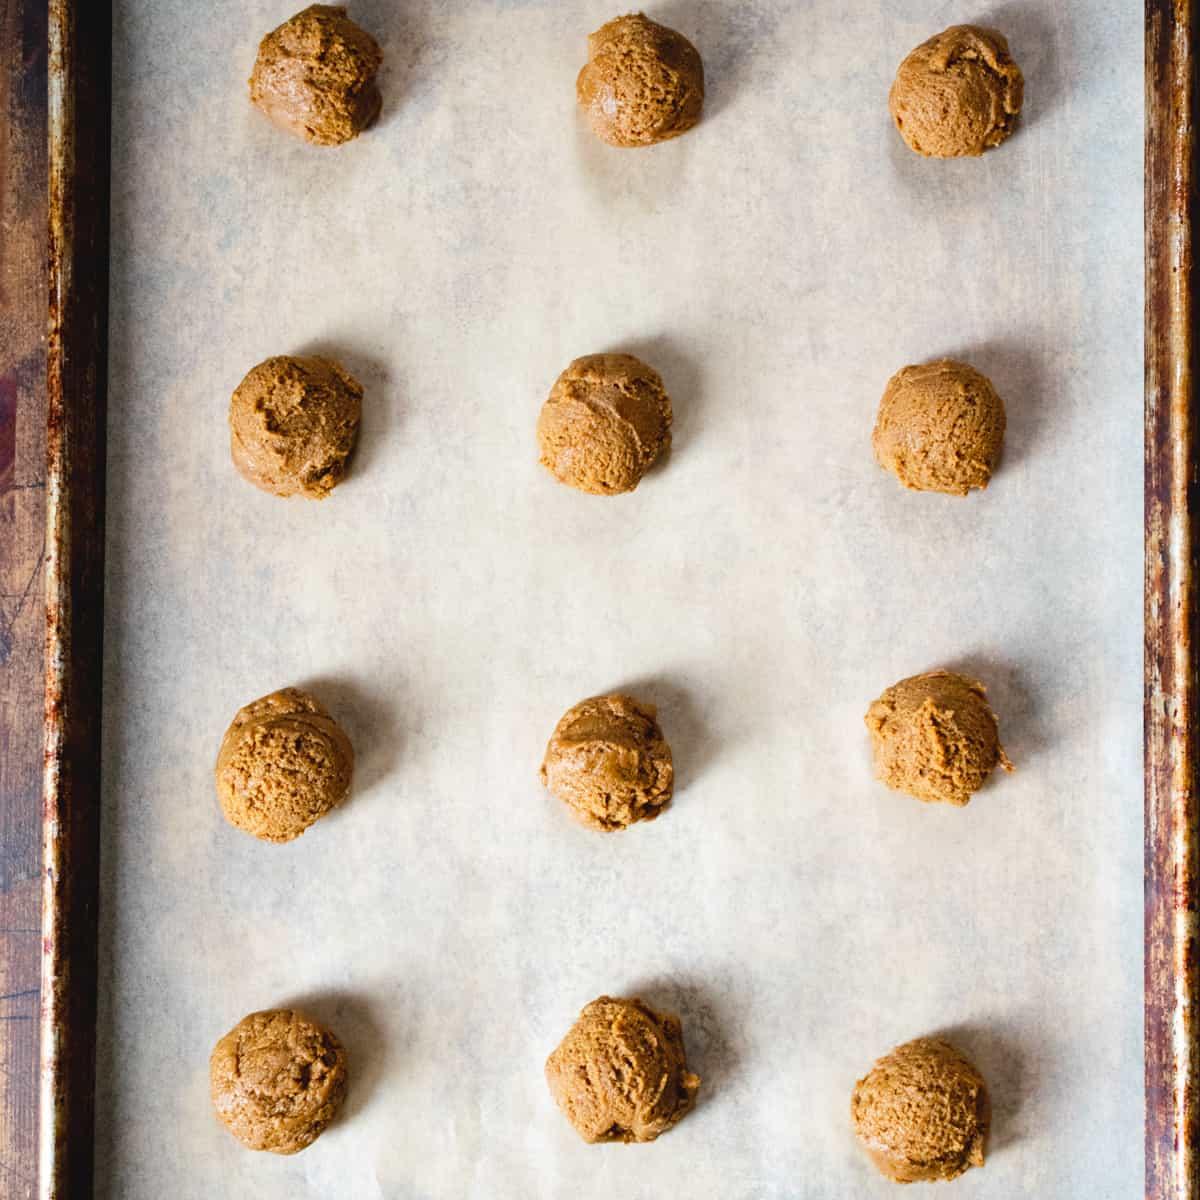 Balls of cookie dough on a baking sheet.